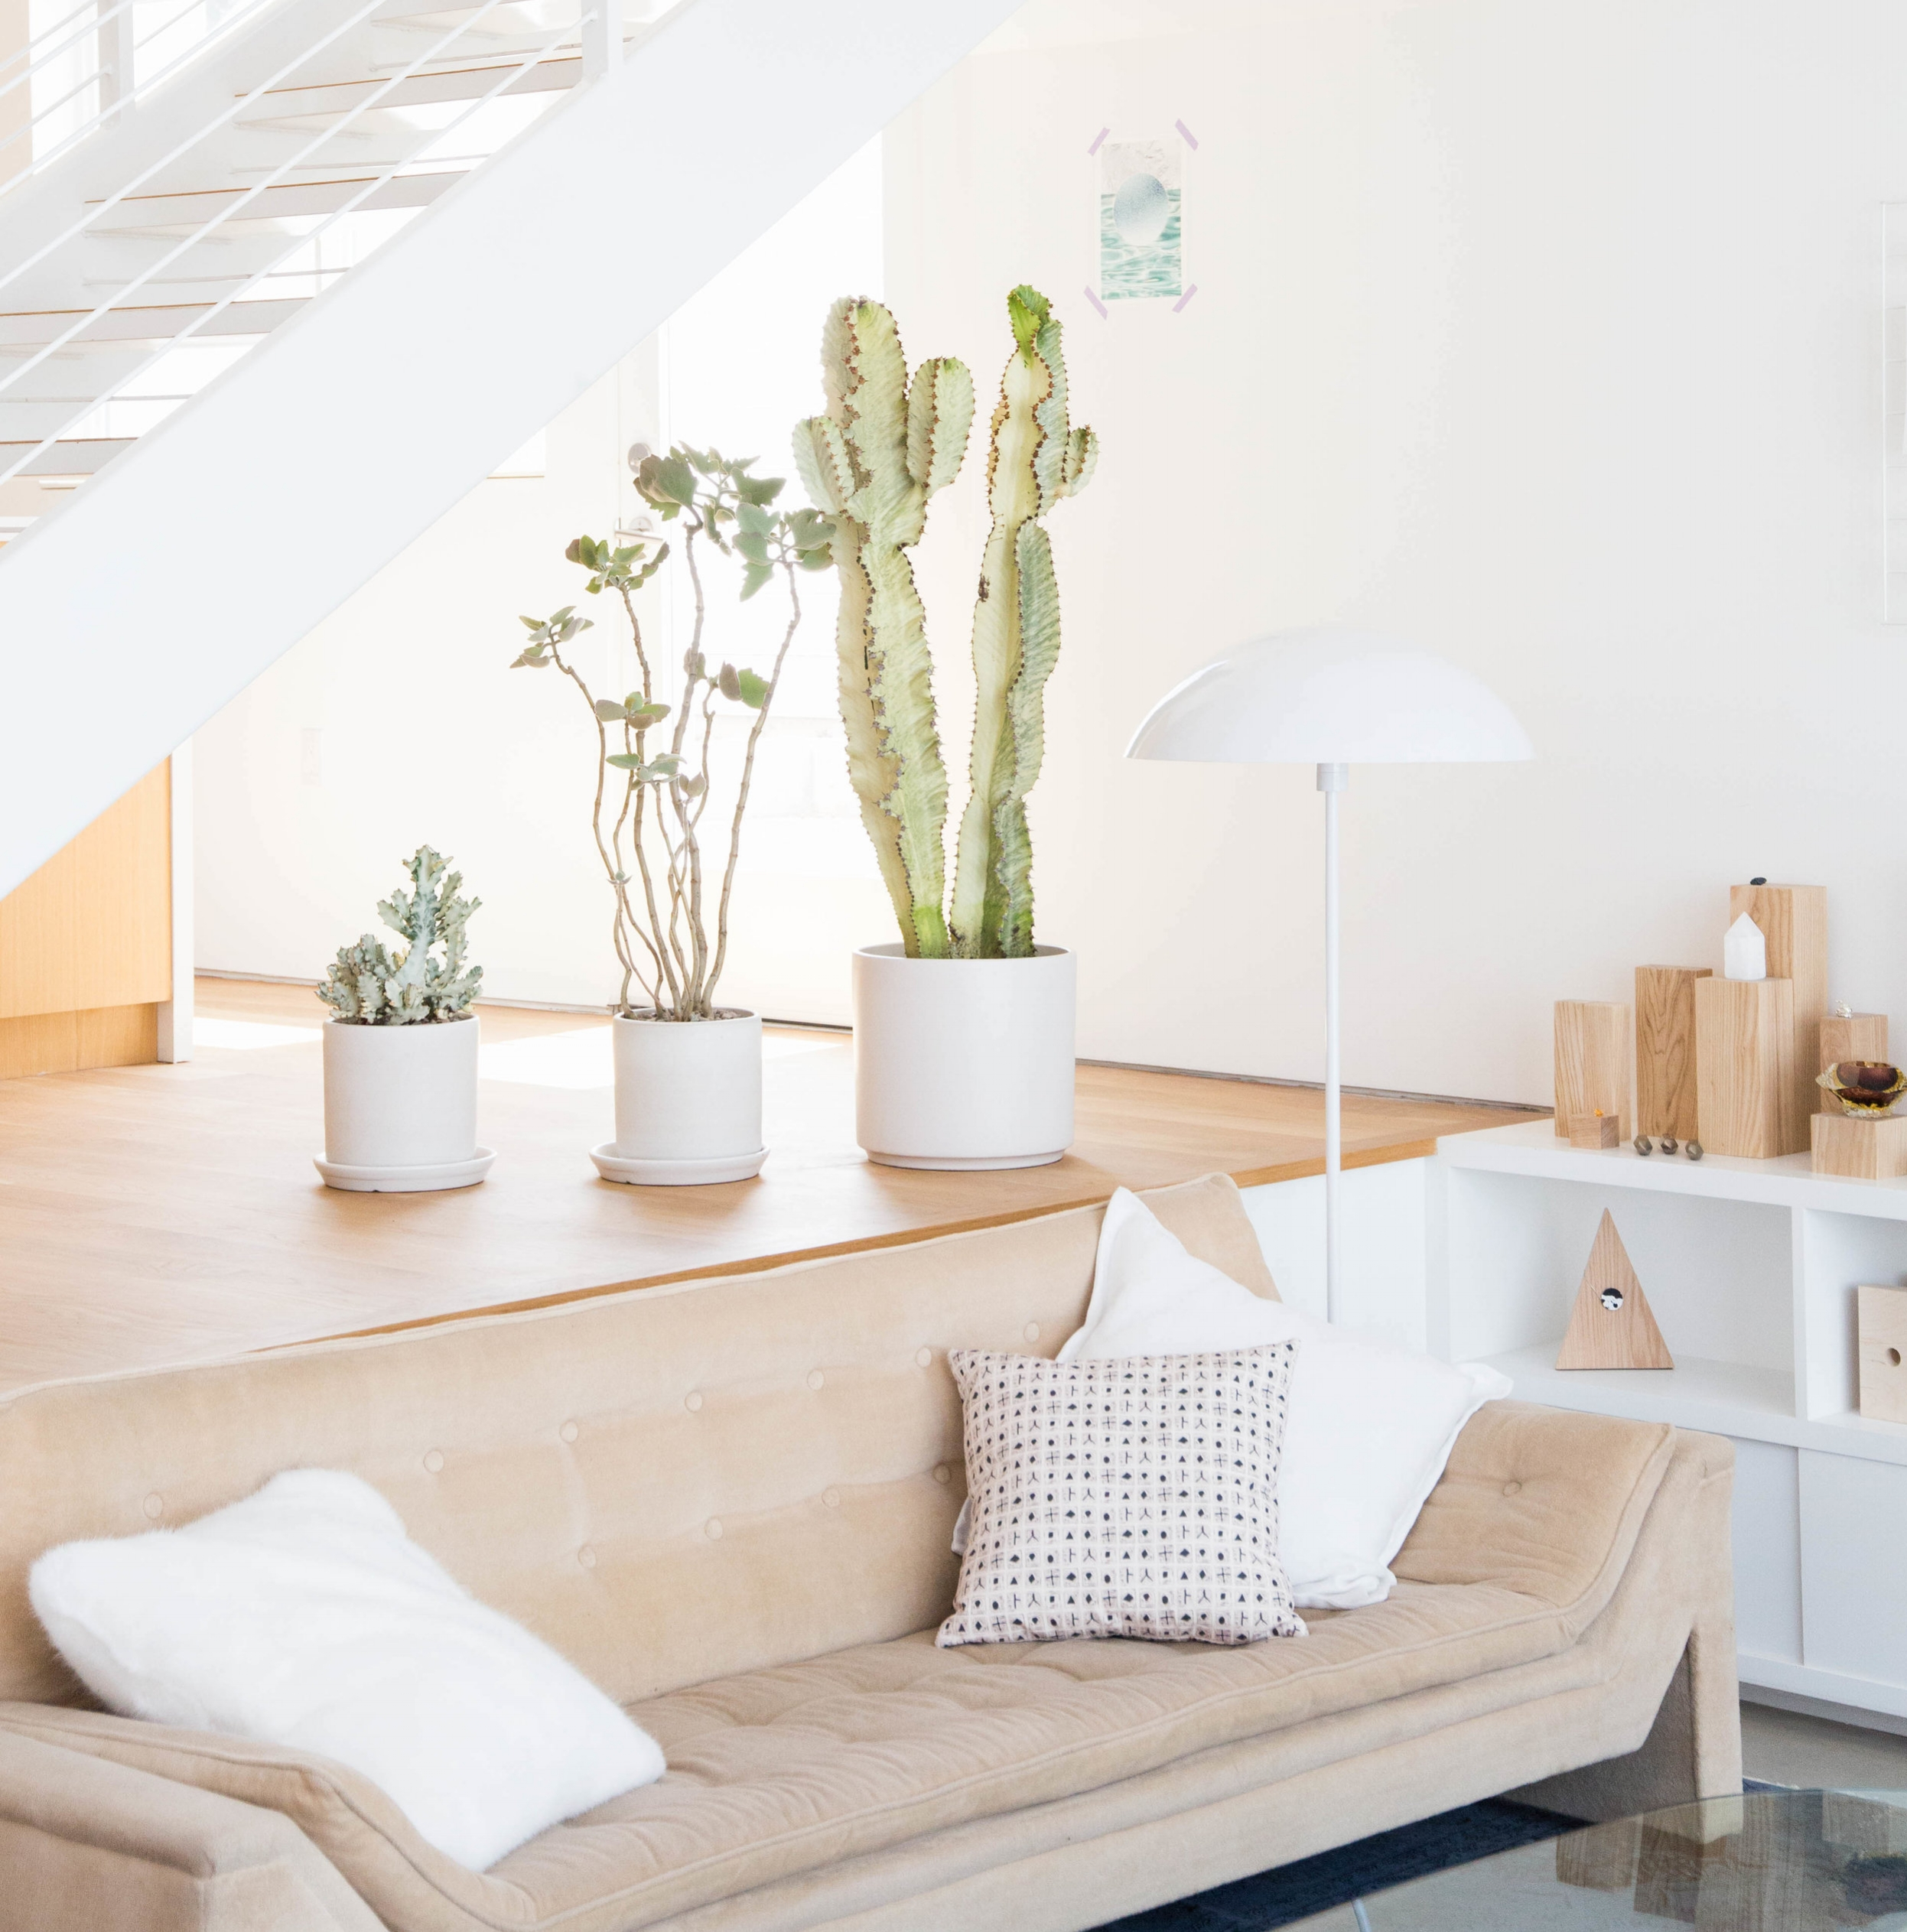 stefanistein-interior-design-jewelry-motif-modern-neutrals-showroom-retail-office-commercial-gondola-sofa-mydomaine-white-minimal